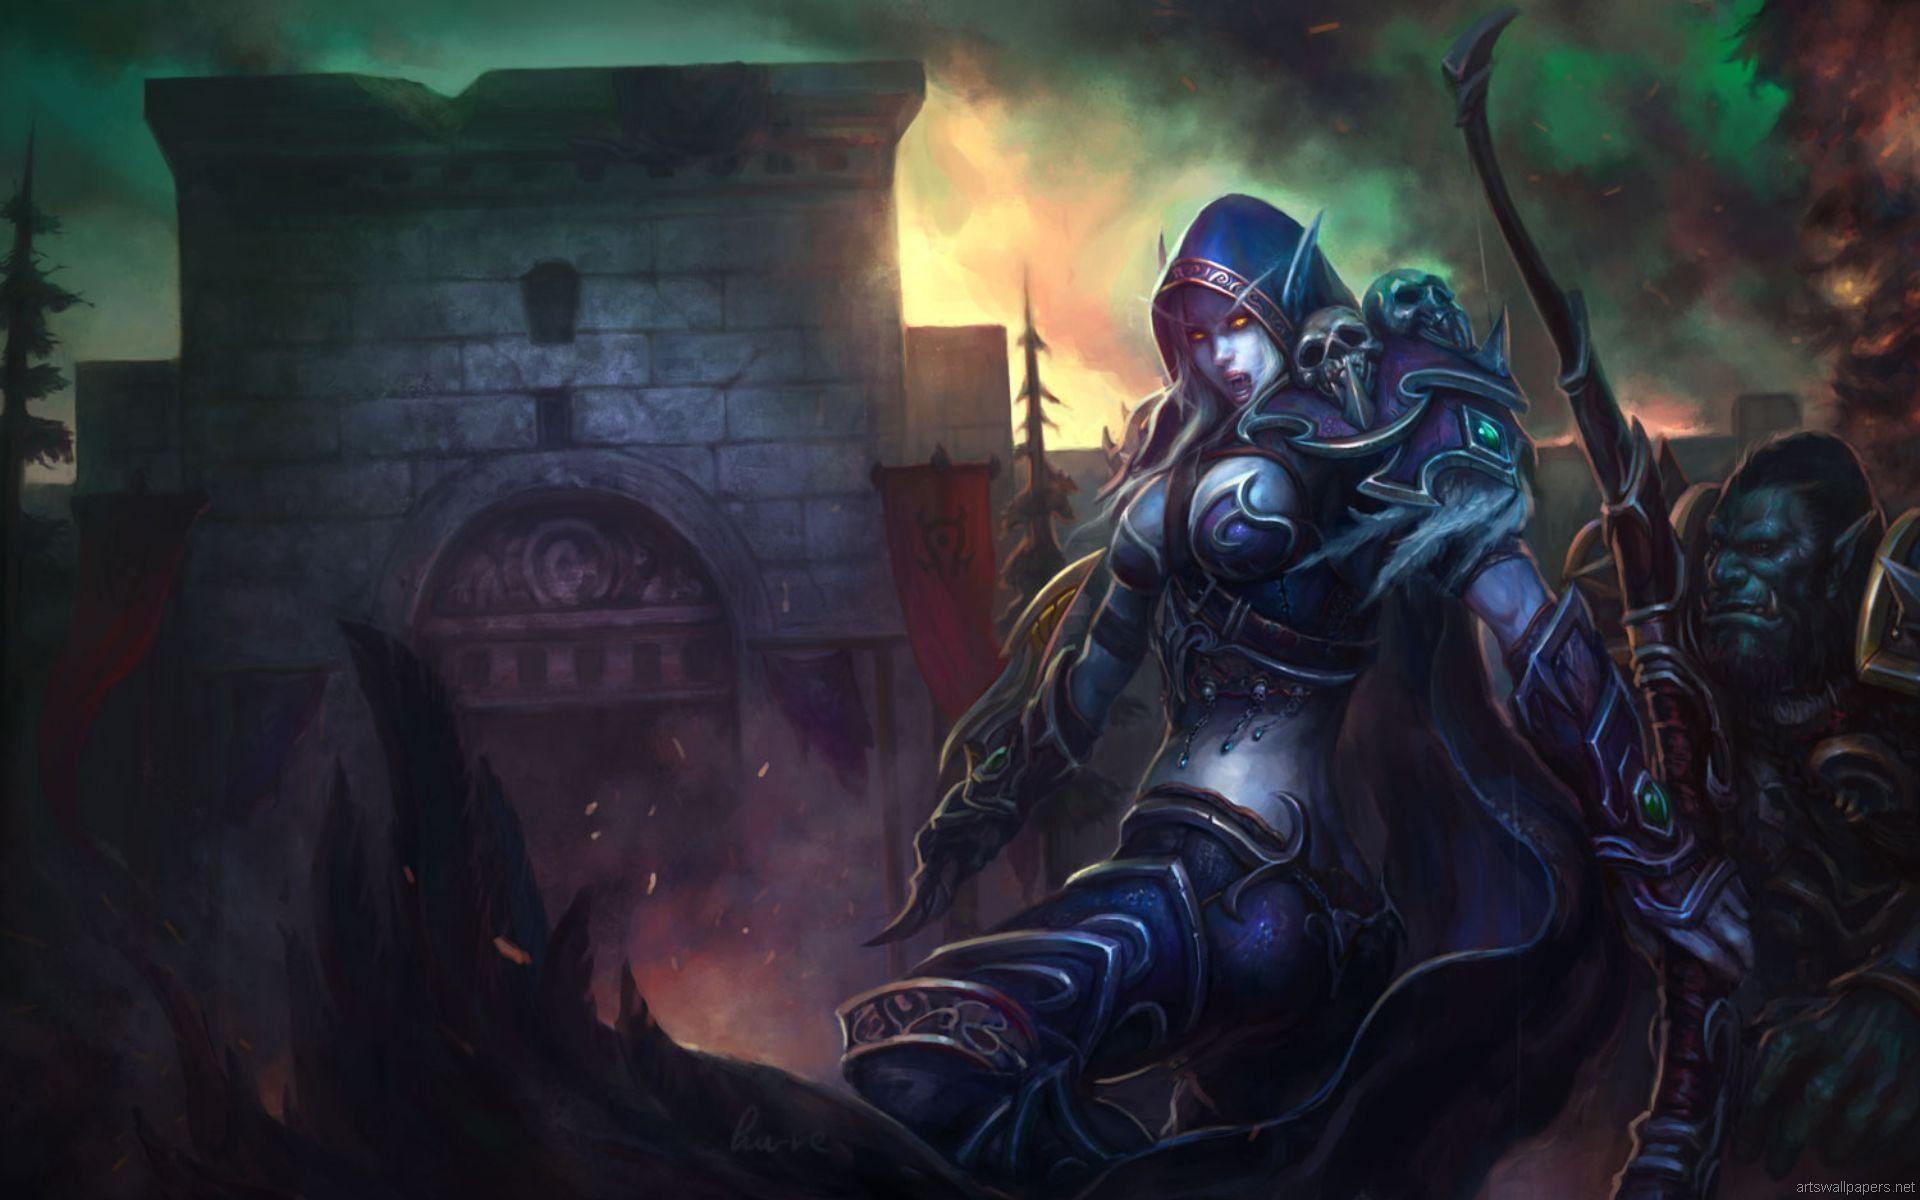 World Of Warcraft Wallpaper Wide Desktop 48682 1920x1200 Px